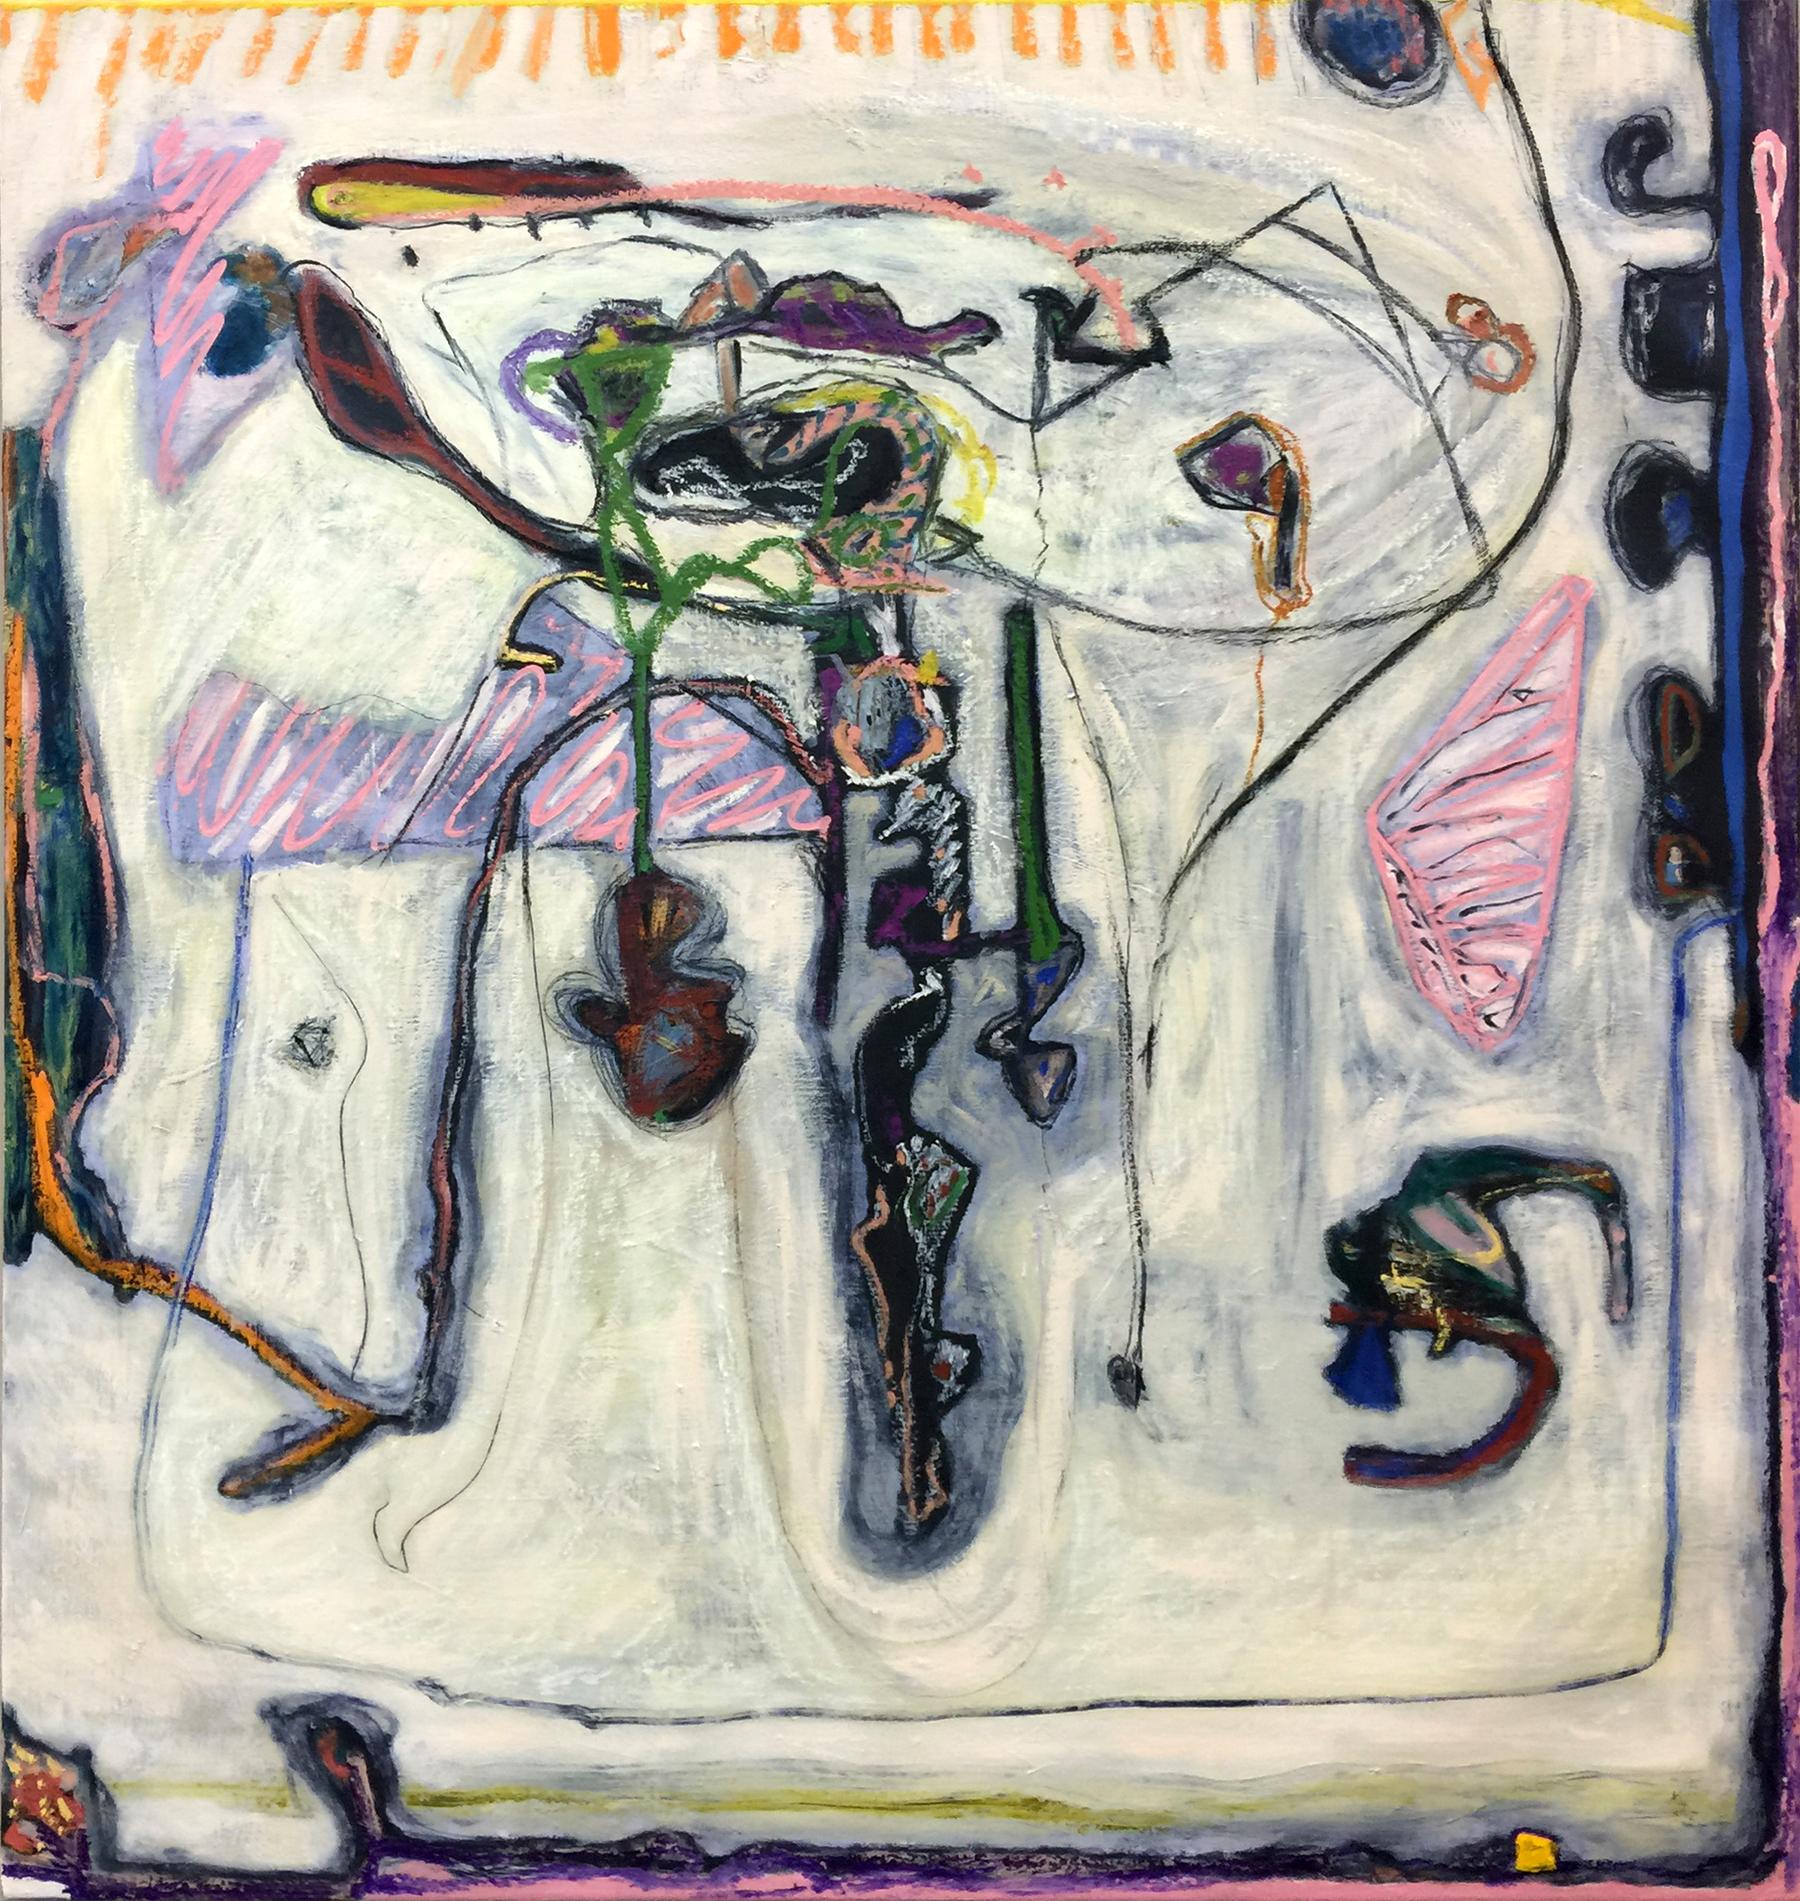 Sarah Dwyer,  Cattywampus , 2016, oil on linen, 55.91 x 51.97 inches, 142 x 132 cm